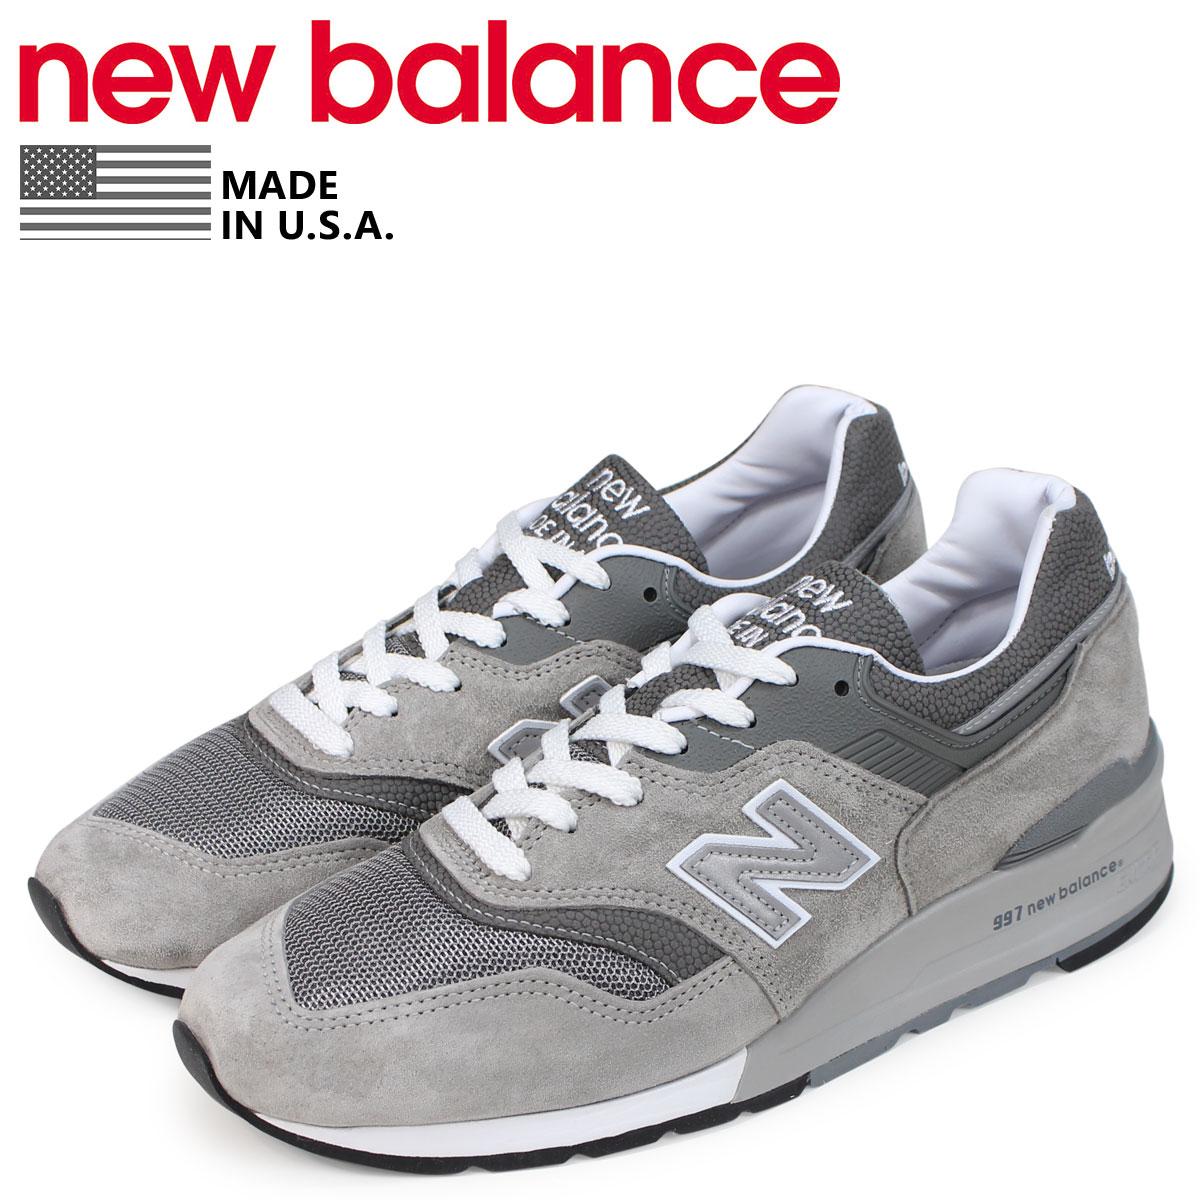 new balance ニューバランス 997 スニーカー メンズ Dワイズ MADE IN USA グレー M997GY